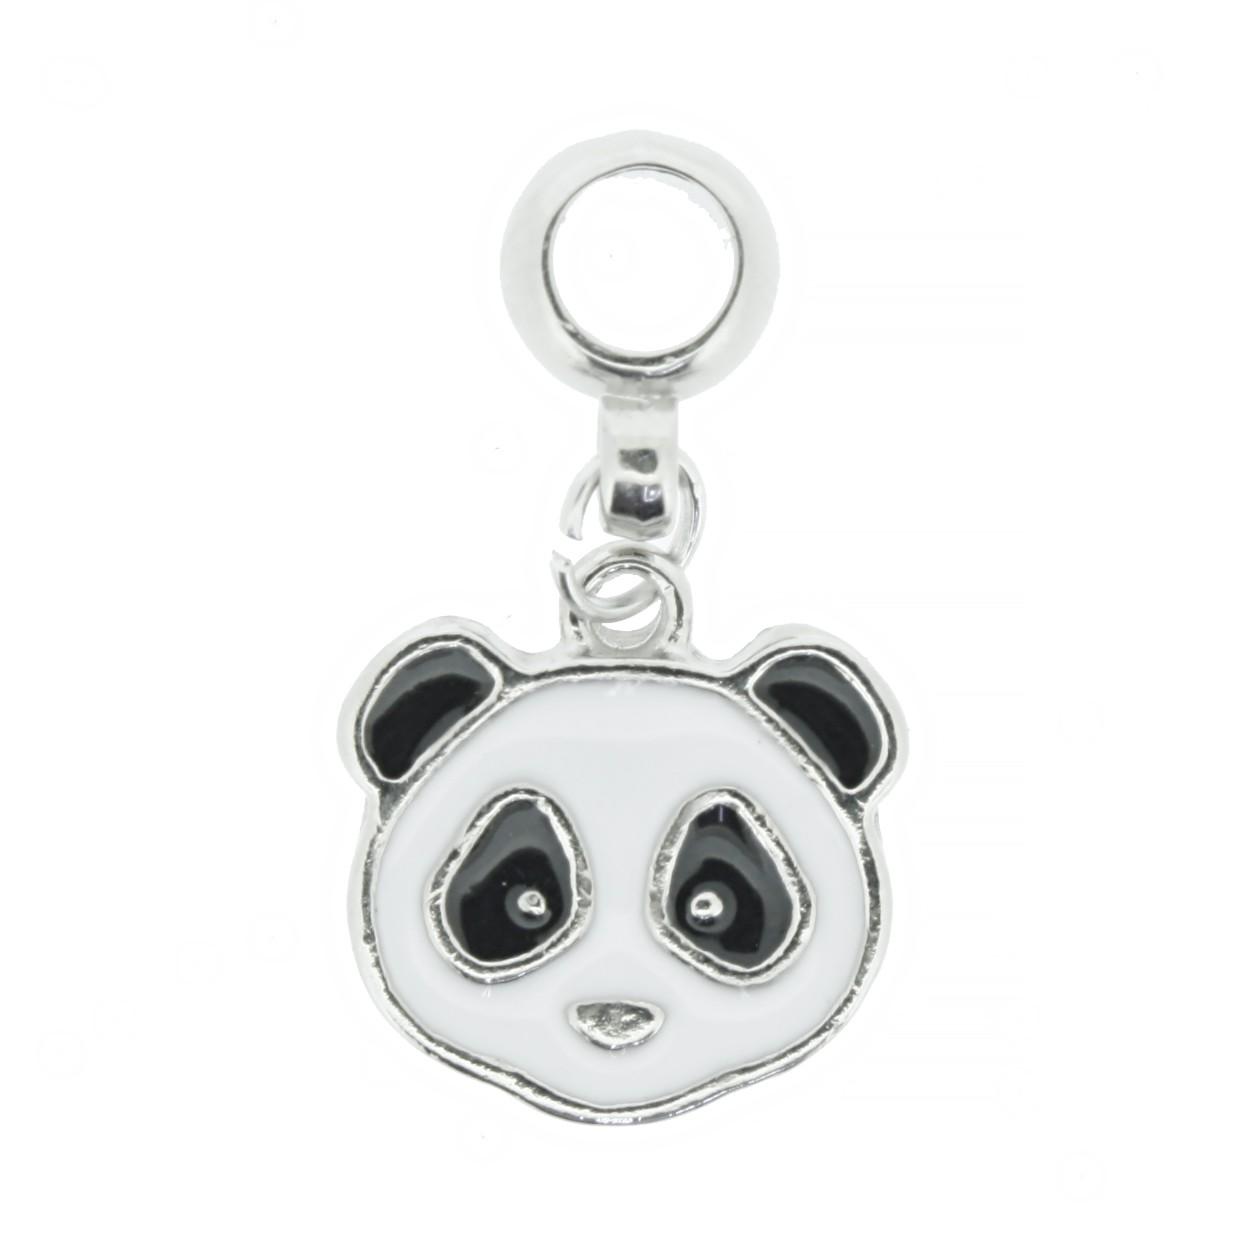 Berloque - Panda - Níquel  - Stéphanie Bijoux® - Peças para Bijuterias e Artesanato